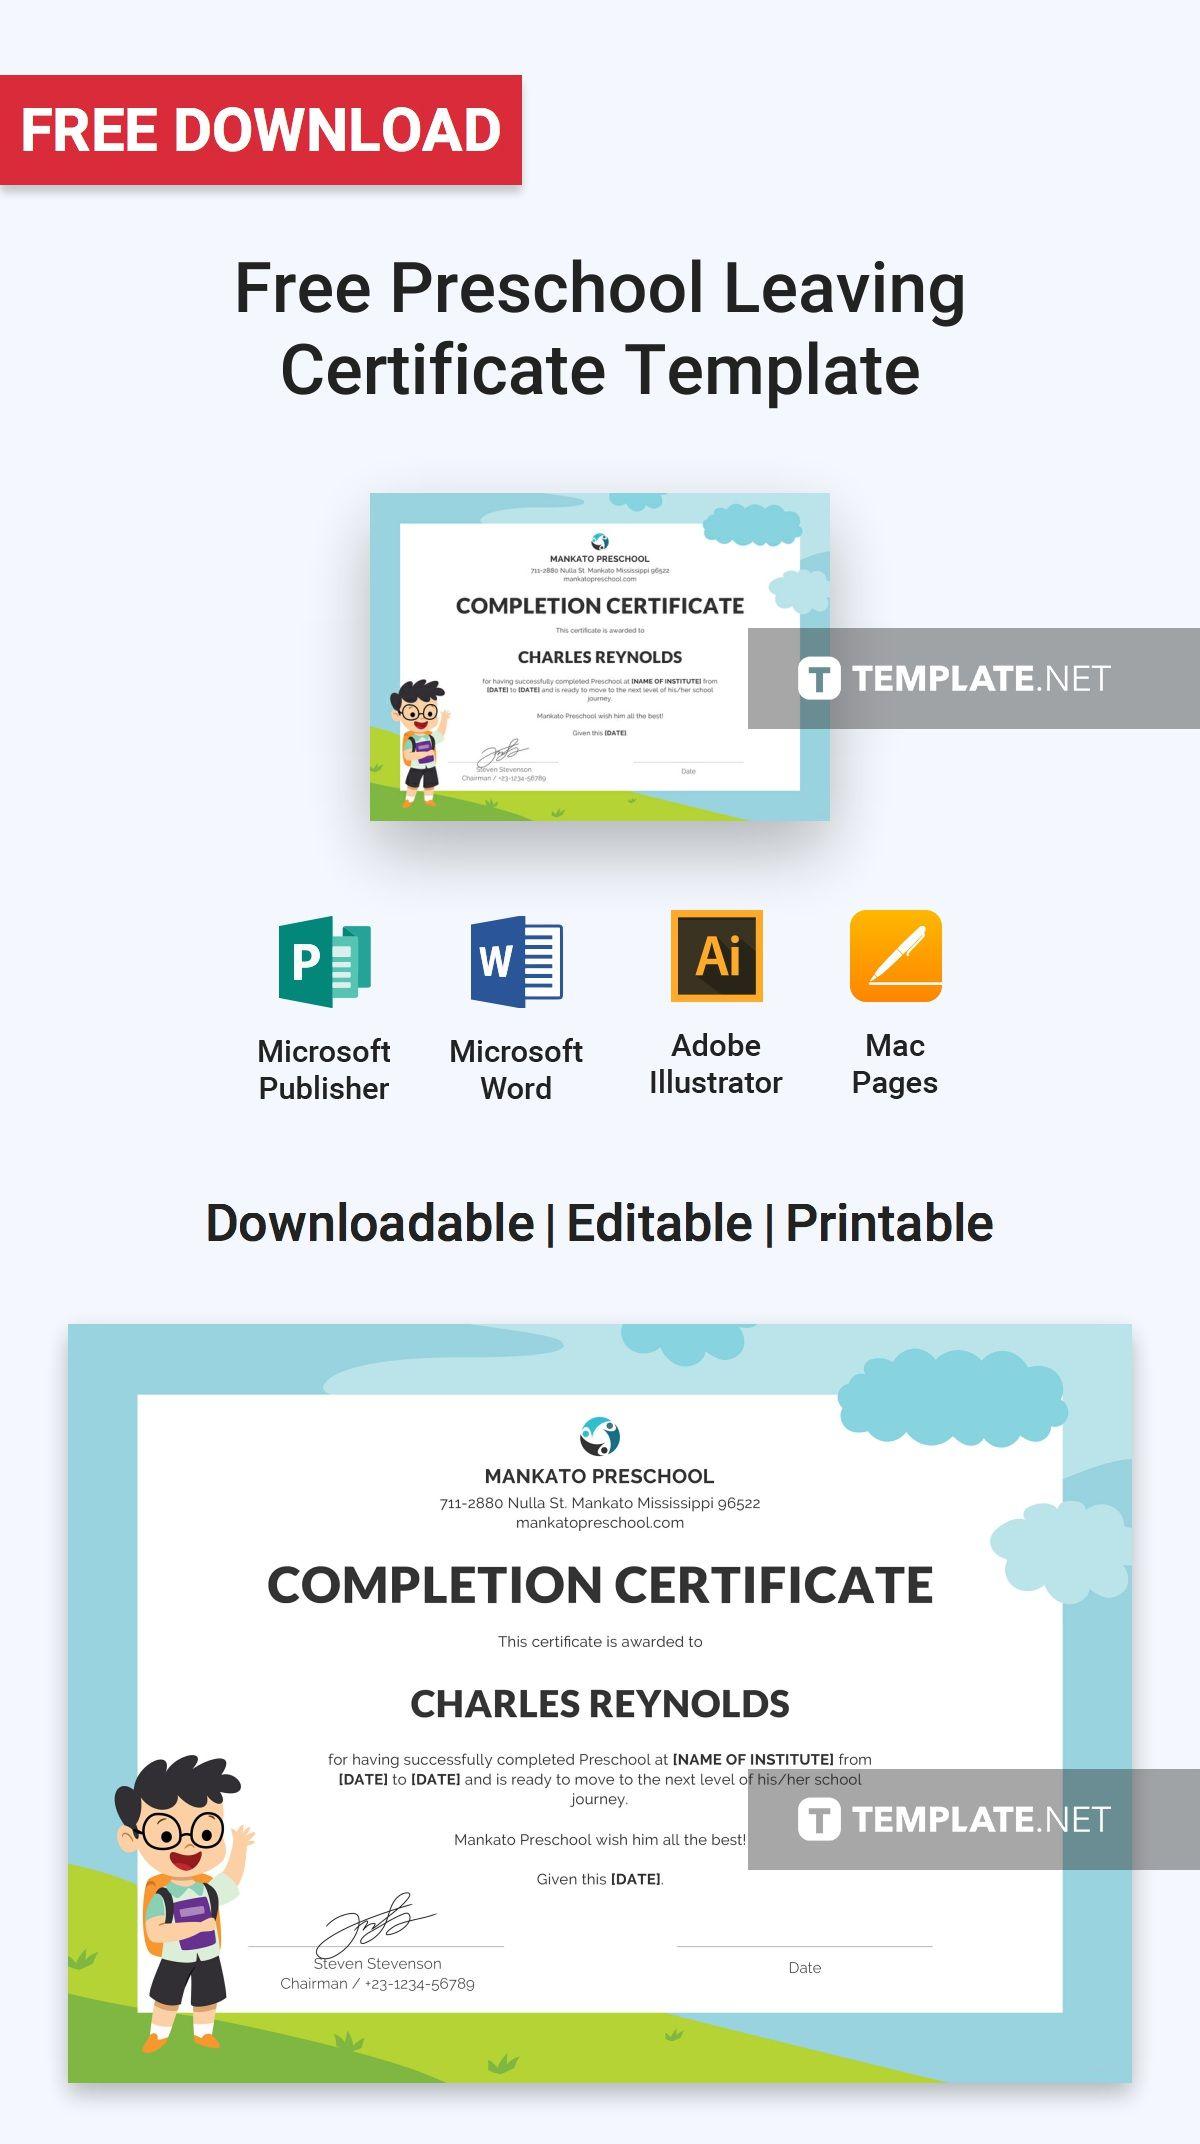 Free Preschool Leaving Certificate School Leaving Certificate